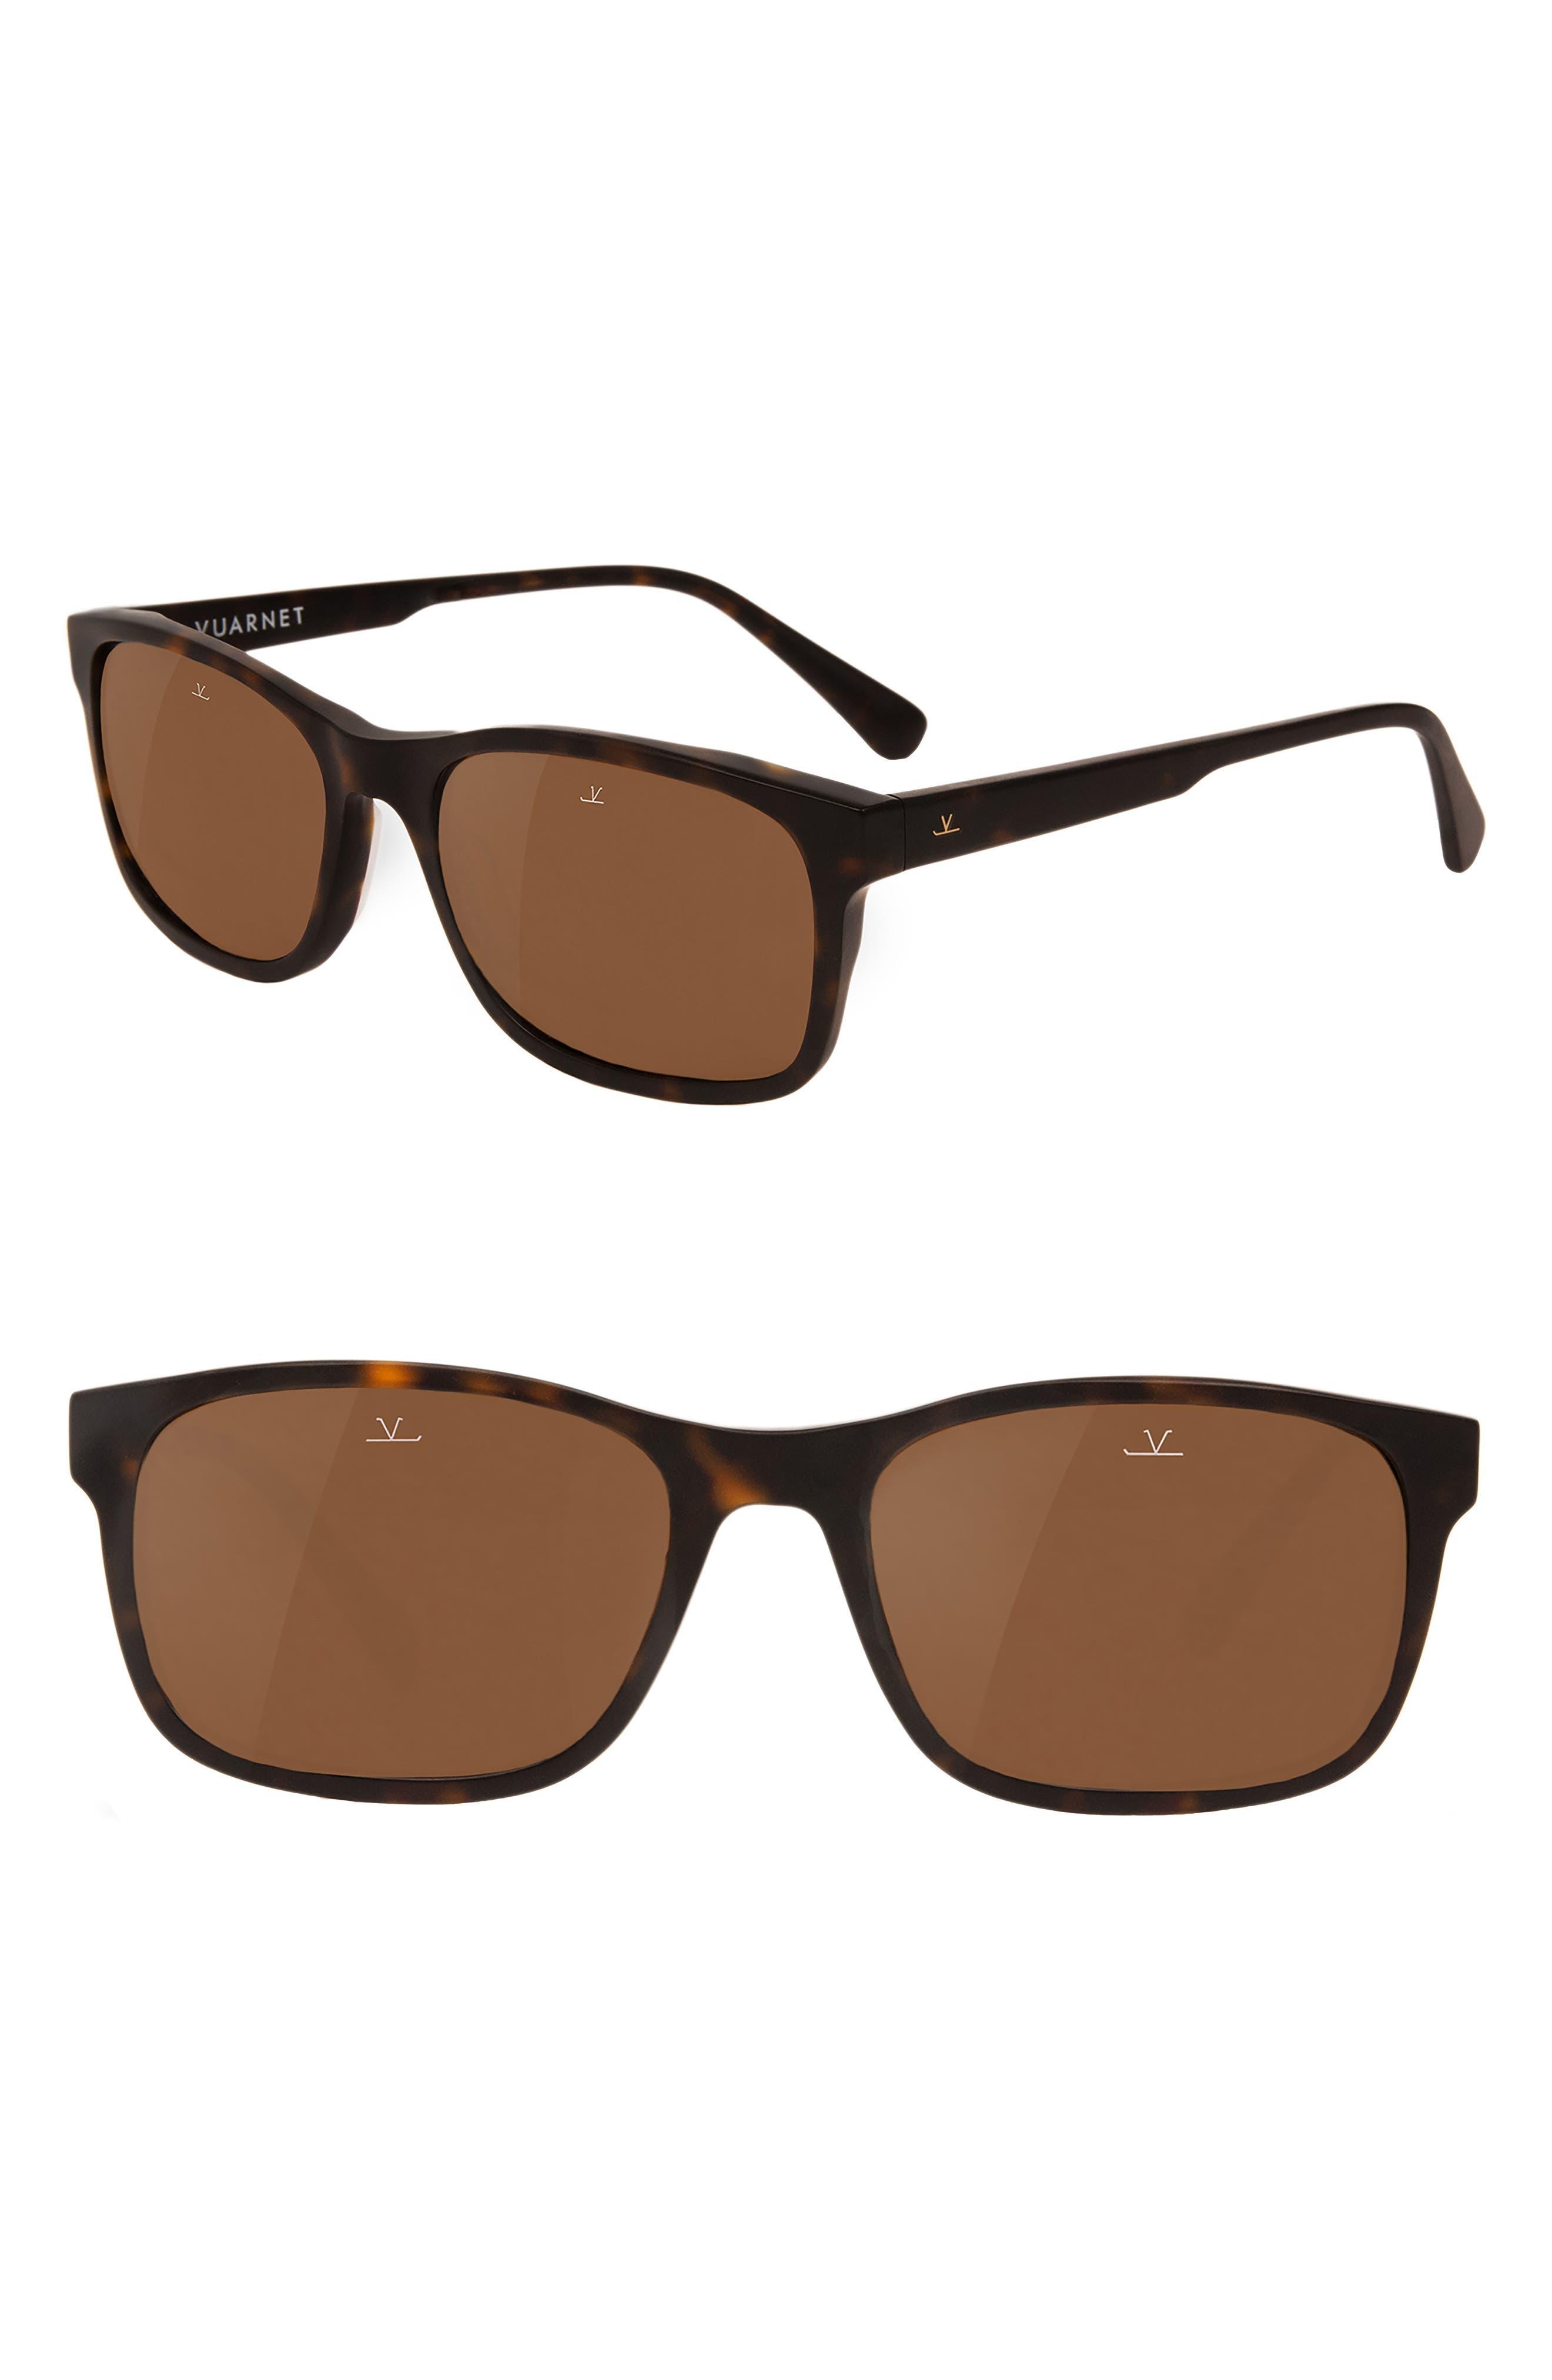 District 55mm Sunglasses,                             Main thumbnail 1, color,                             PURE BROWN